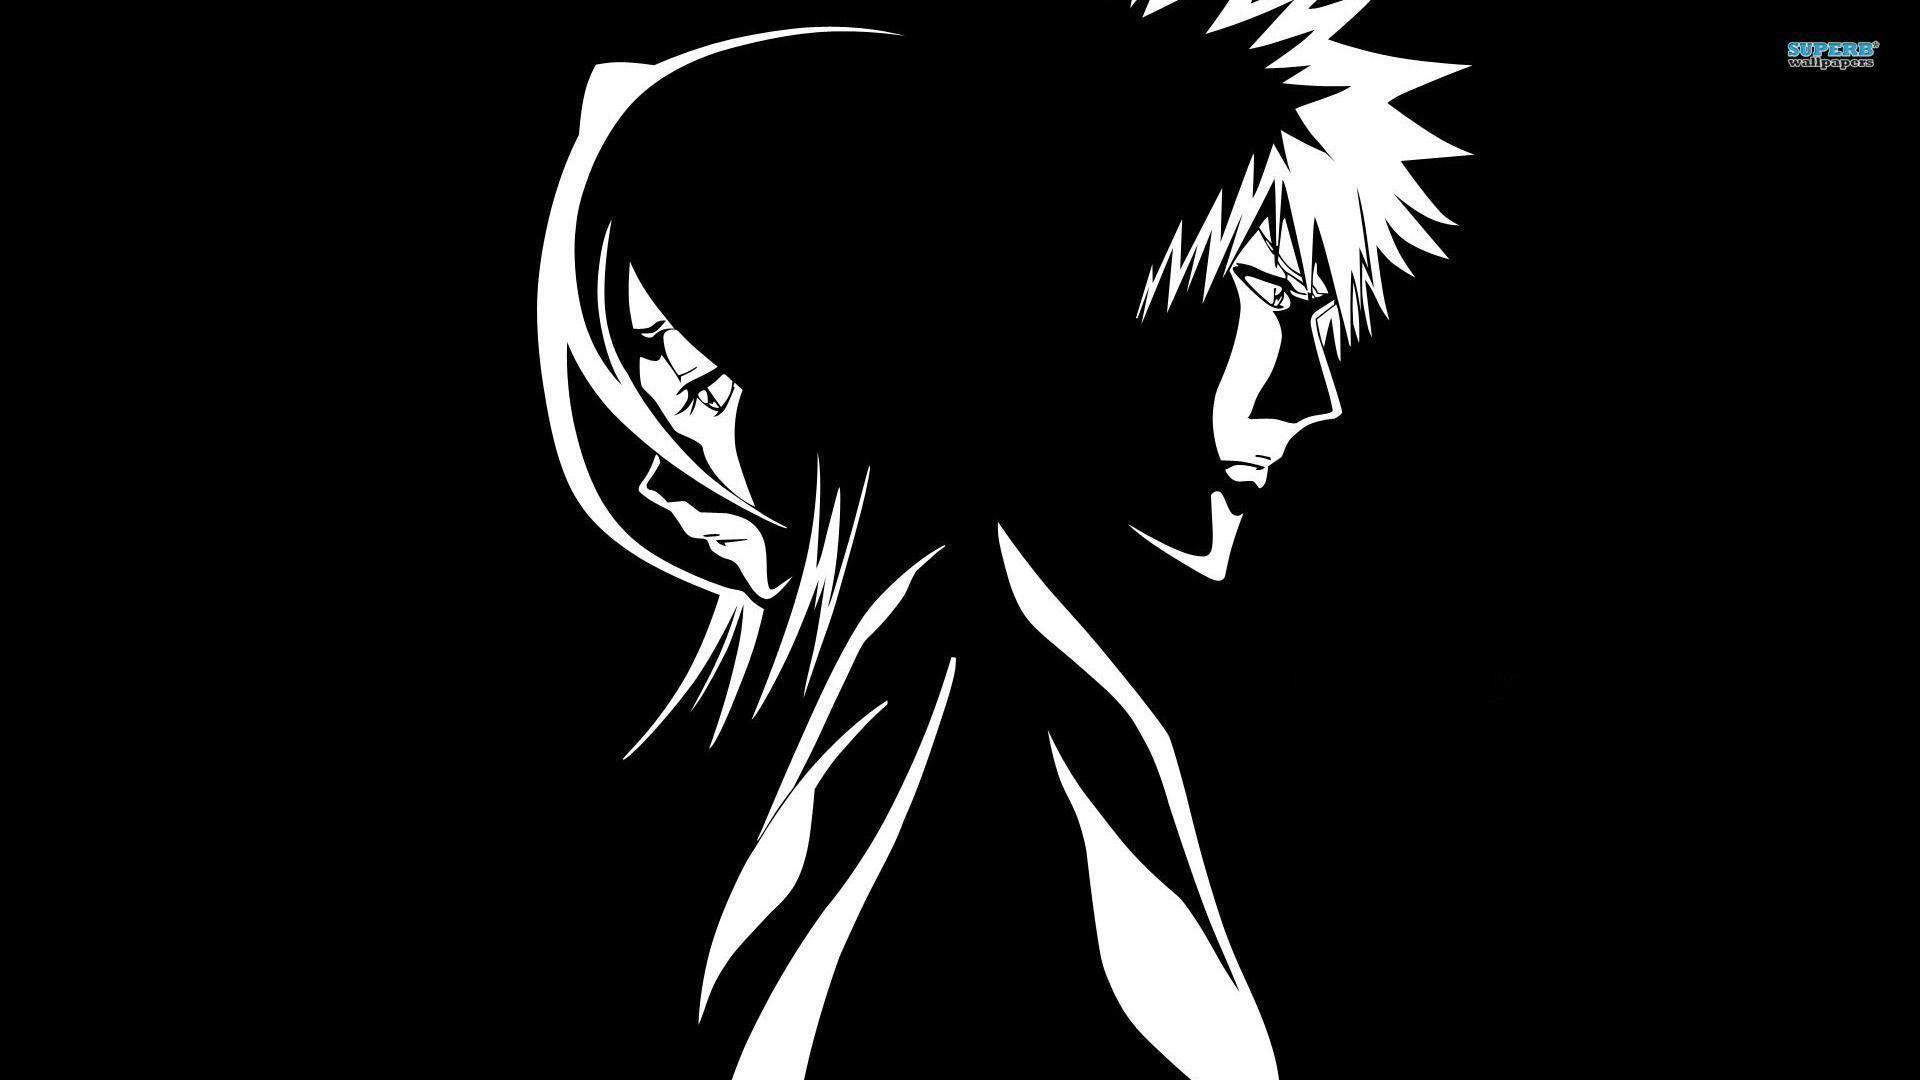 free download wallpaper anime bleach